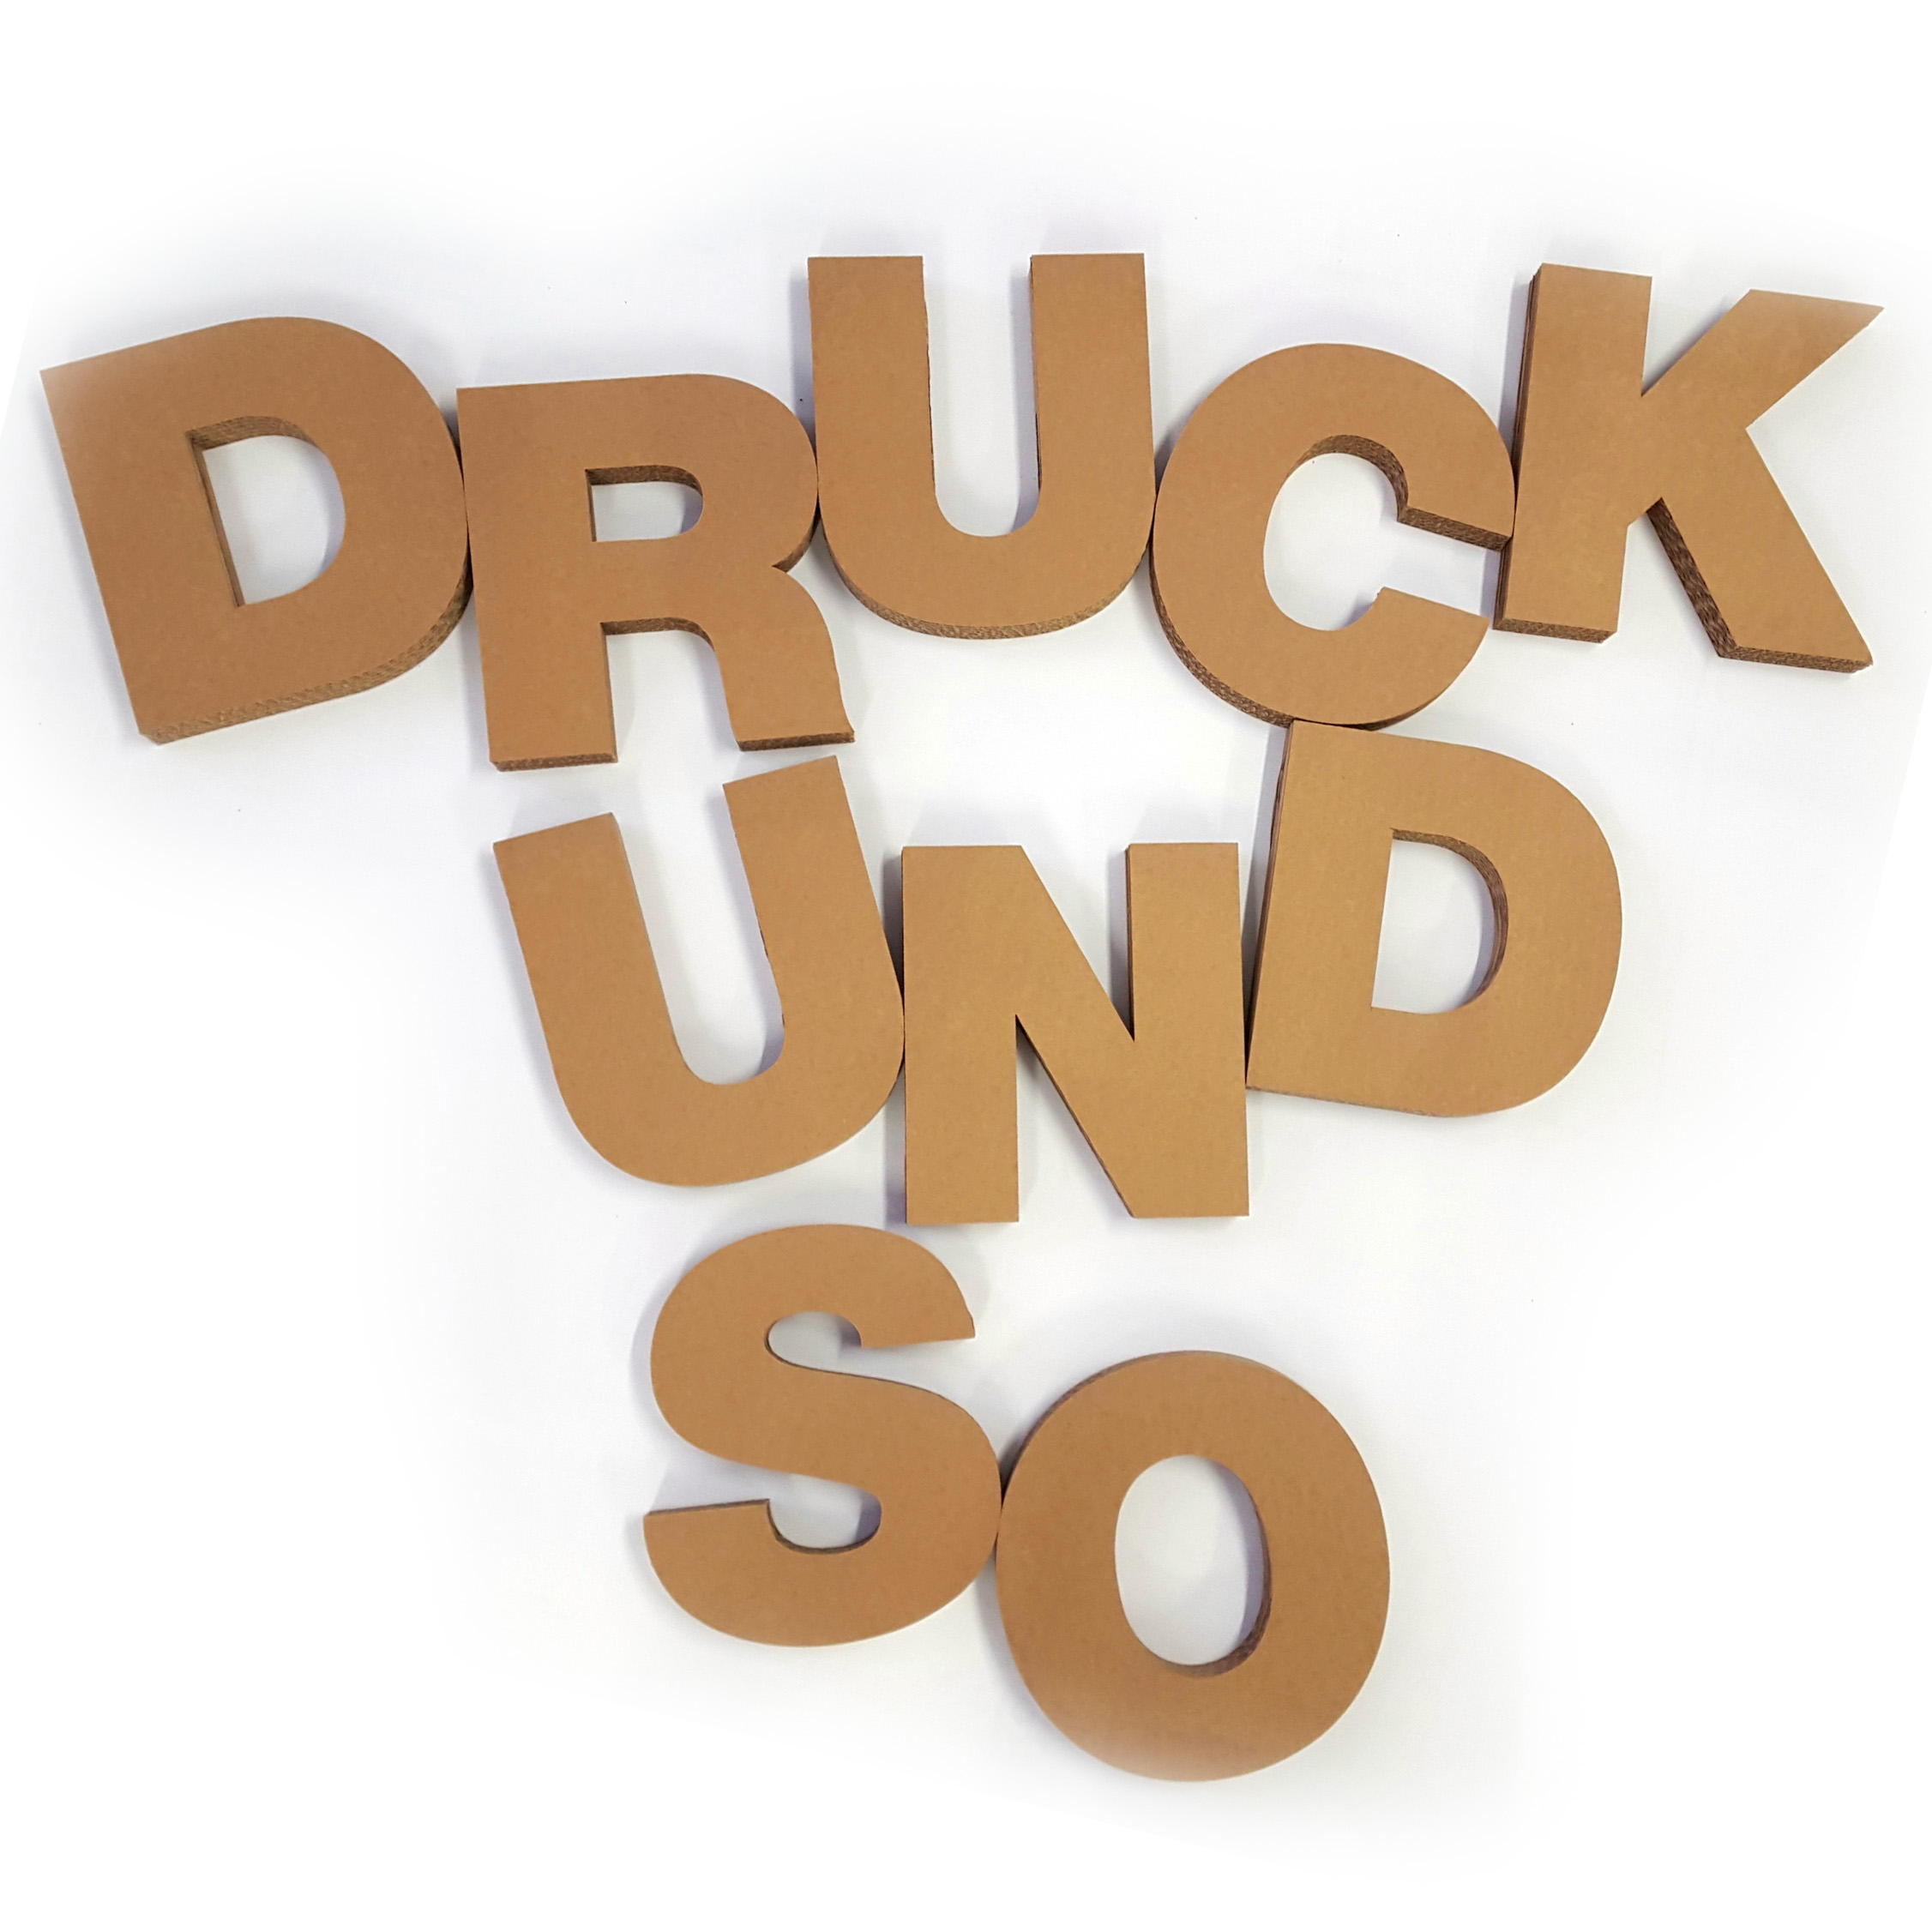 Deko Buchstaben Pappe druckundso.de pappe | kleinbuchstaben, dekoration, wellpappe